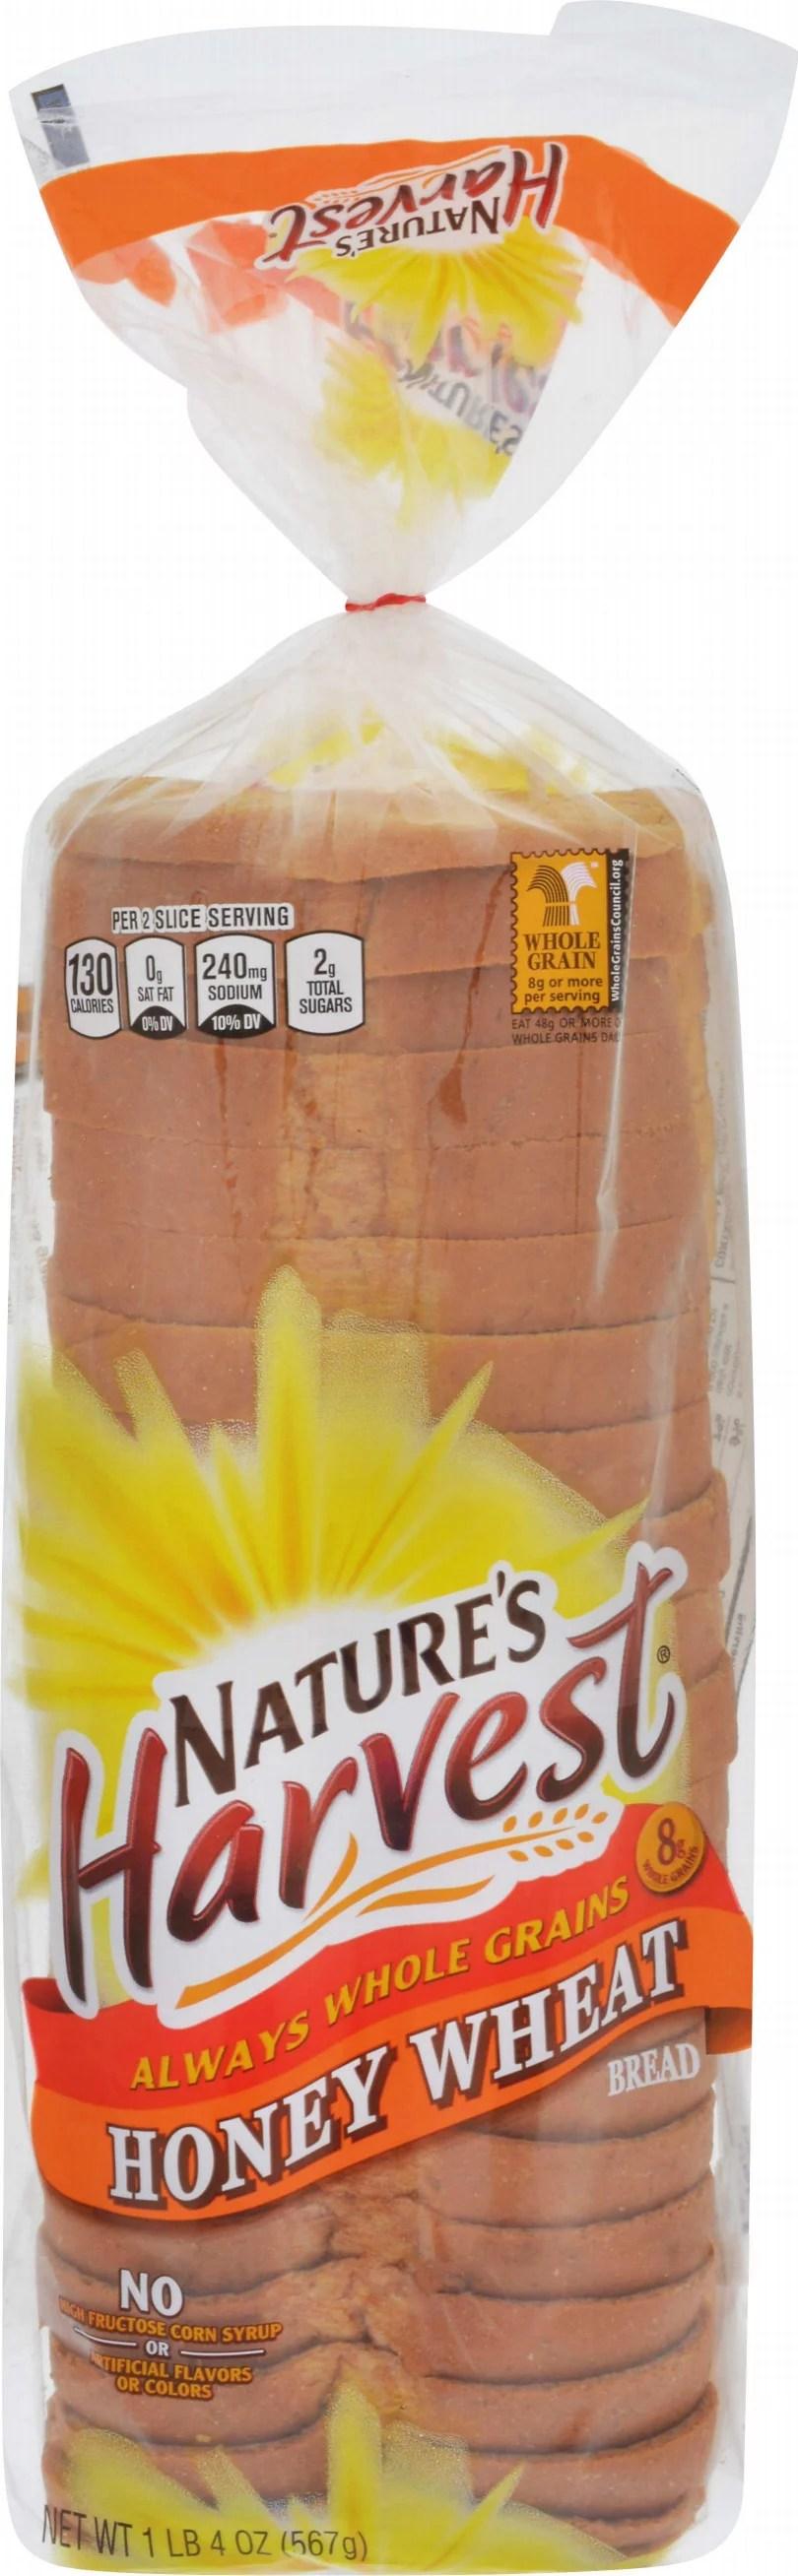 Nature's Harvest Honey Wheat Bread 20 oz - Walmart.com